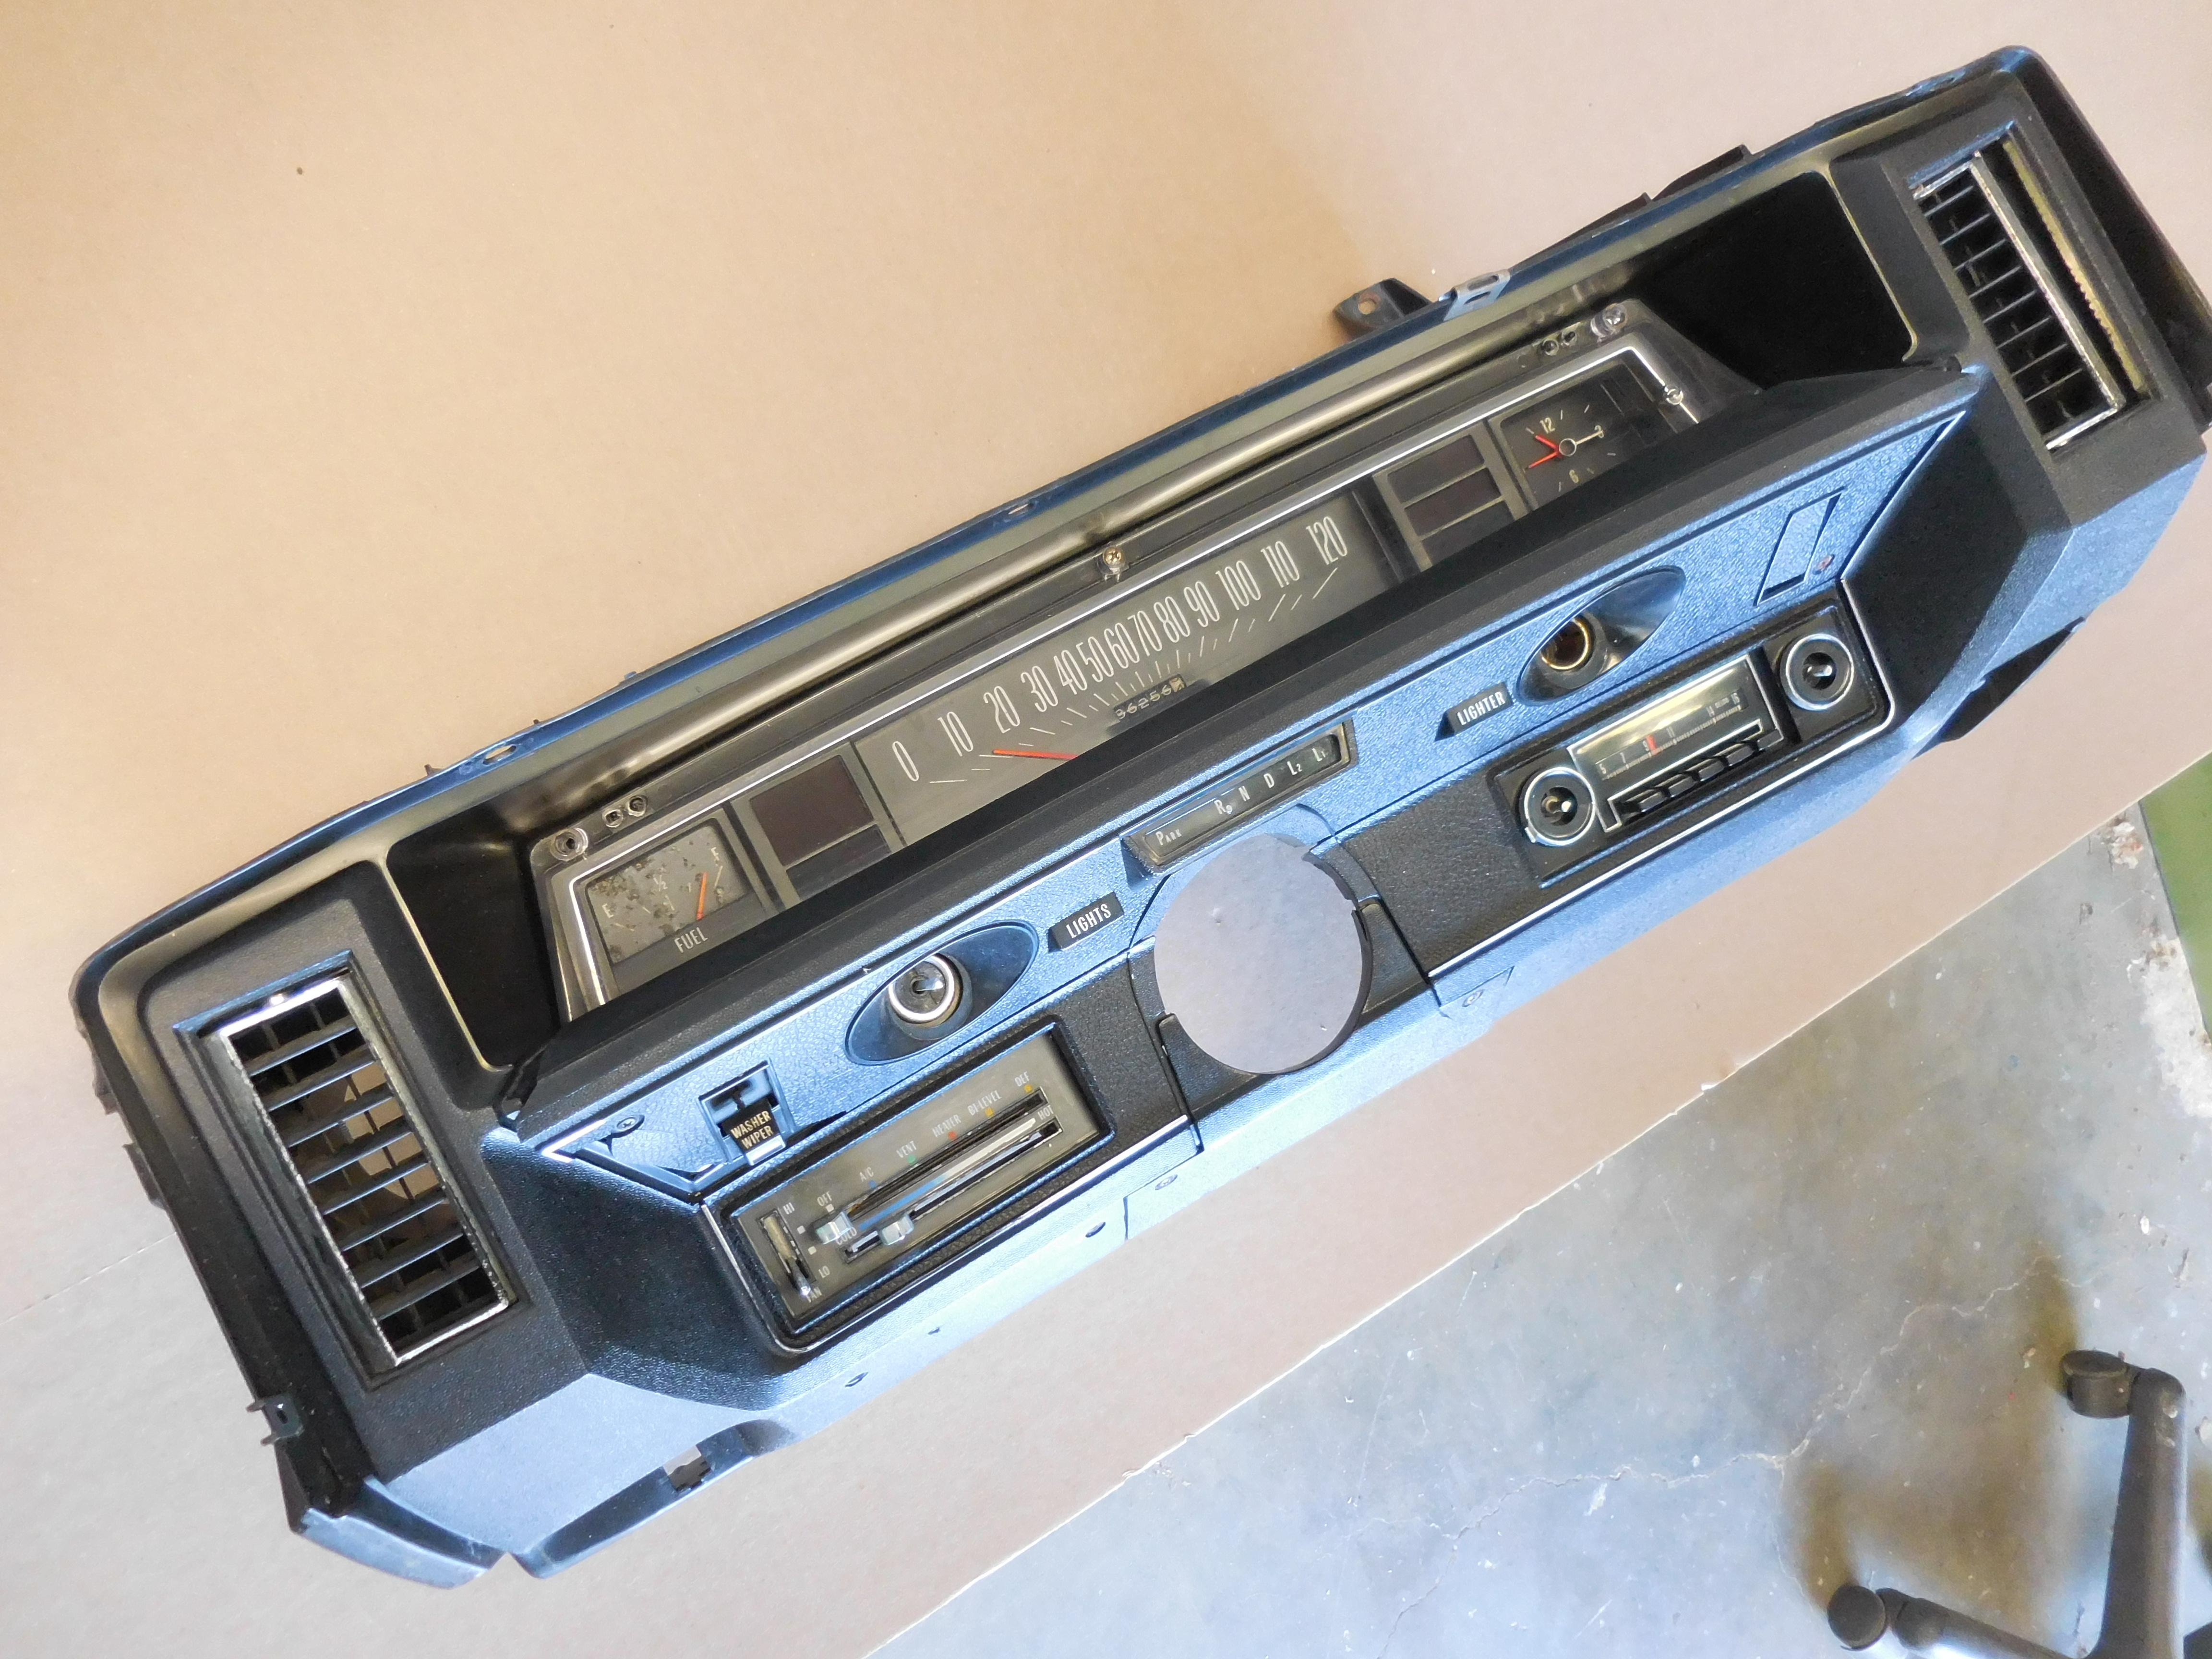 BKA30 R7 Stepper Motor,Auto instrument step motor,General